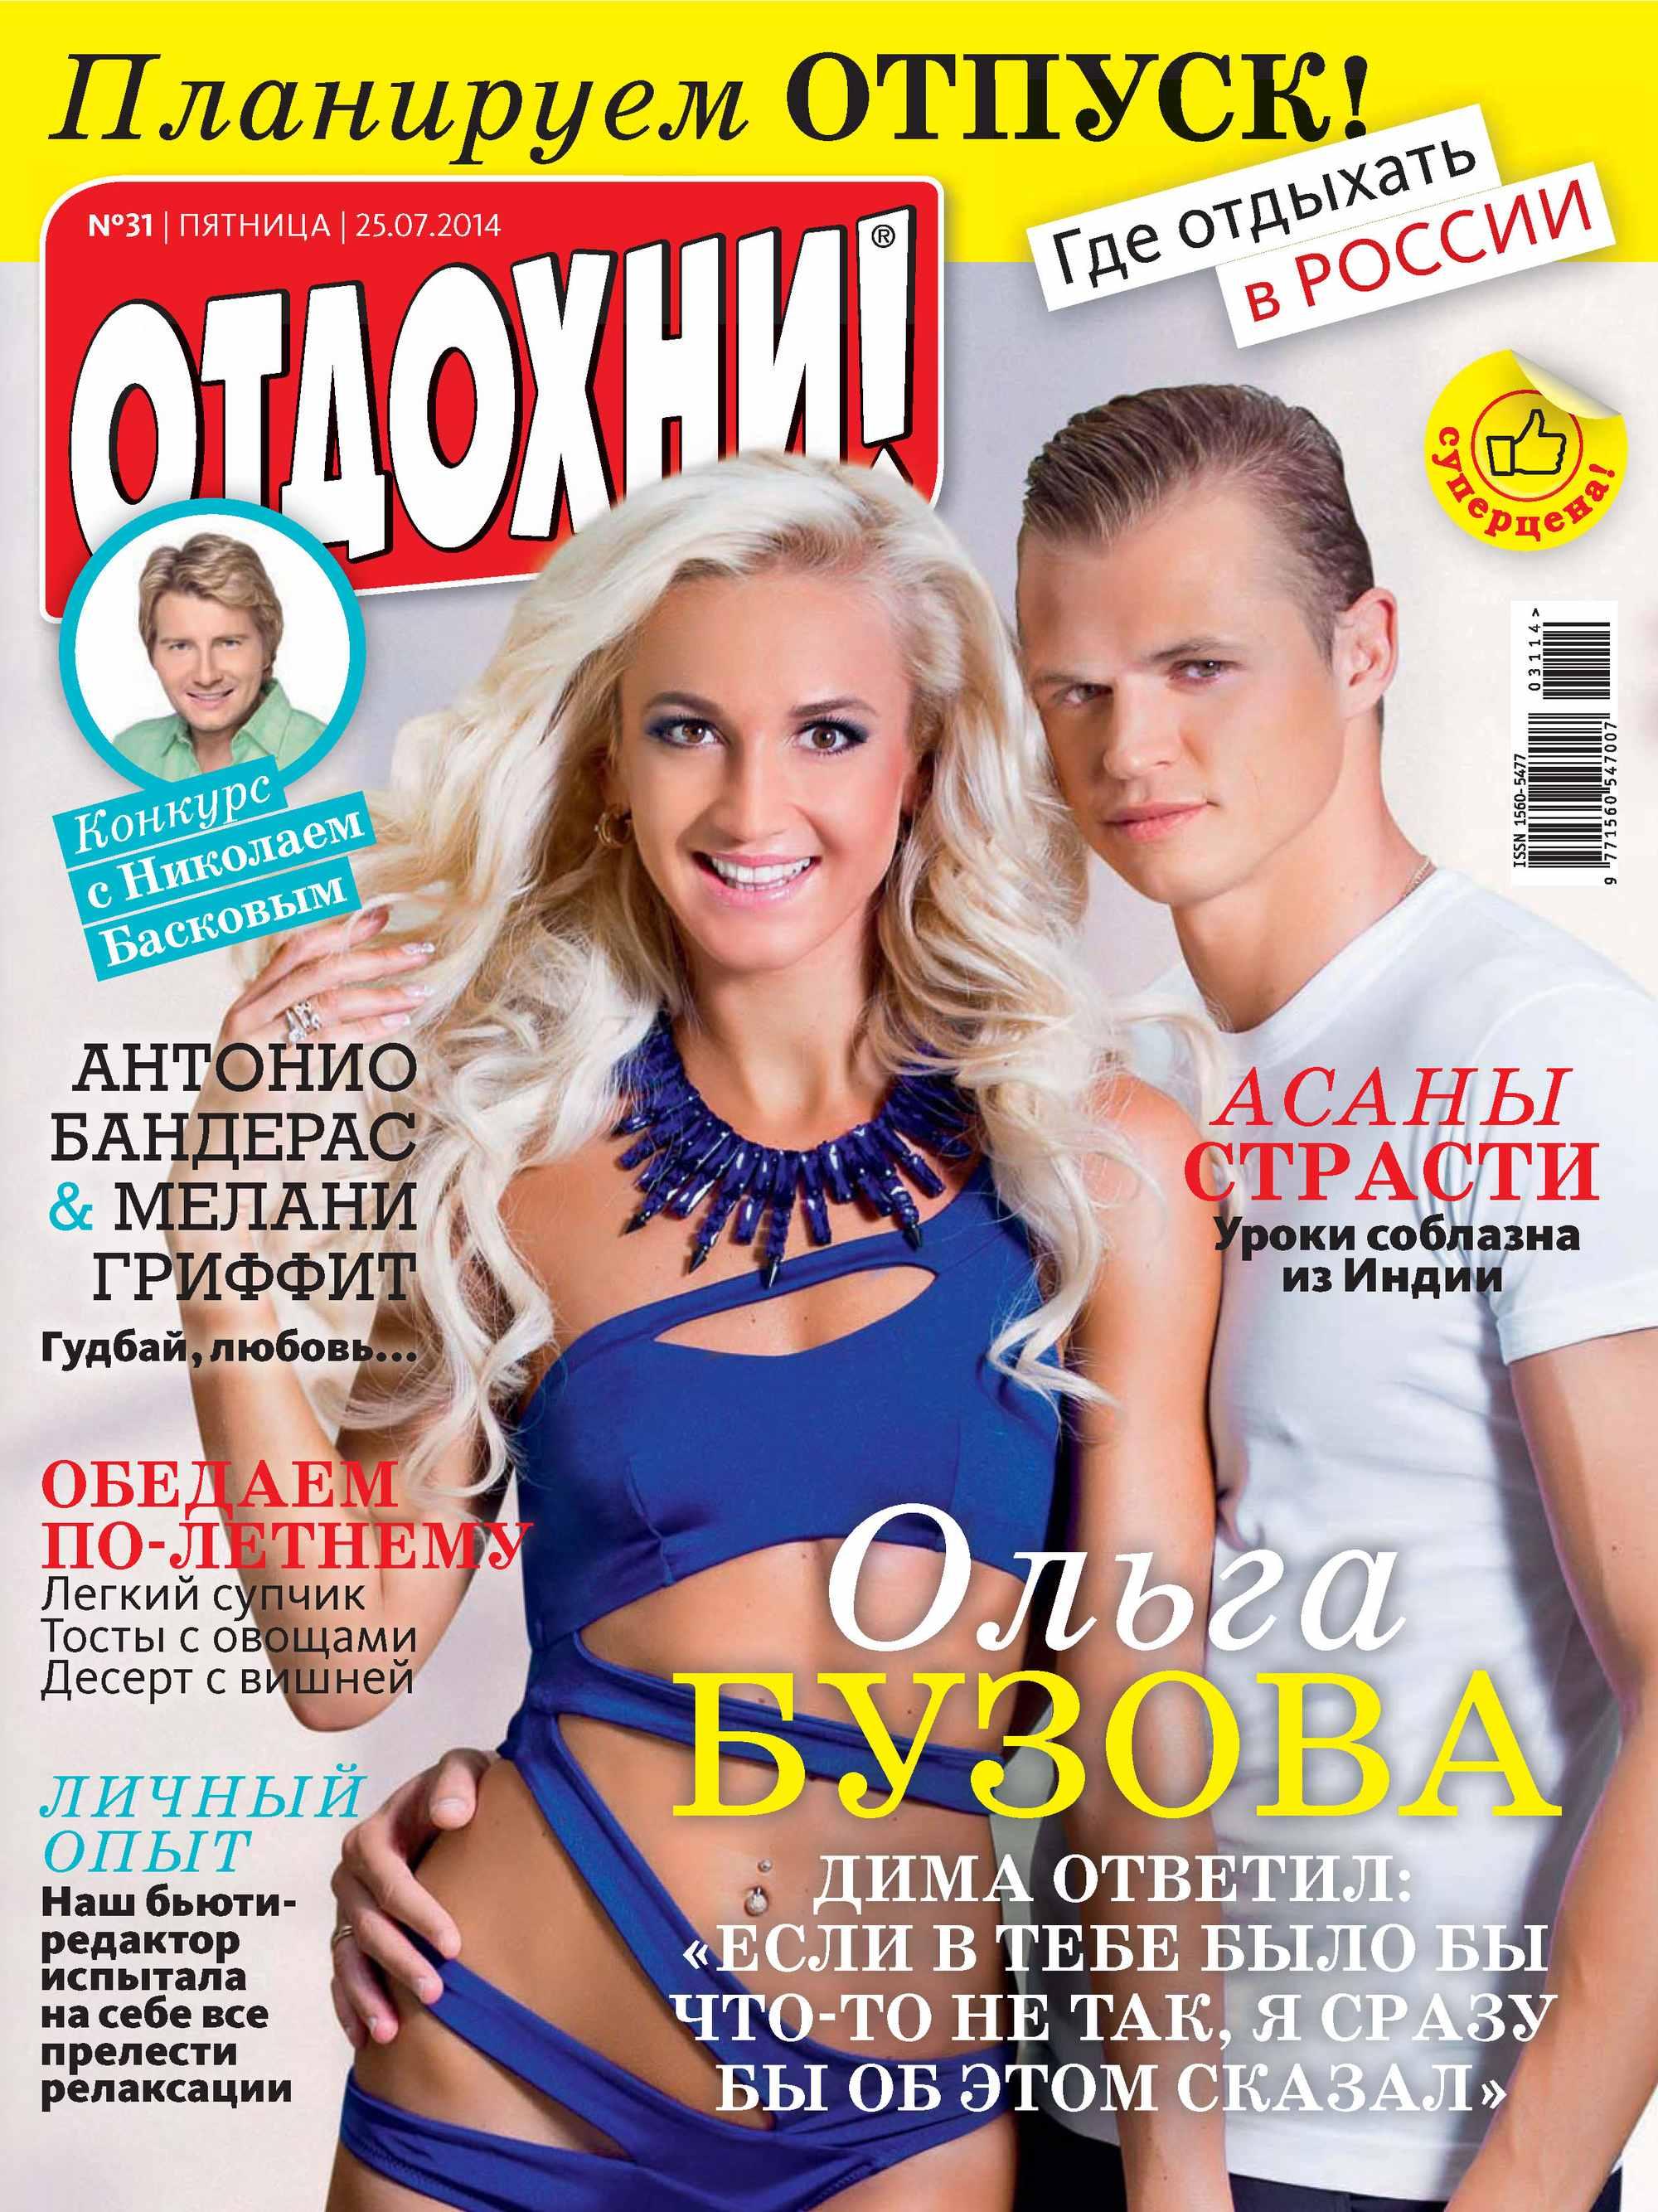 ИД «Бурда» Журнал «Отдохни!» №31/2014 цена